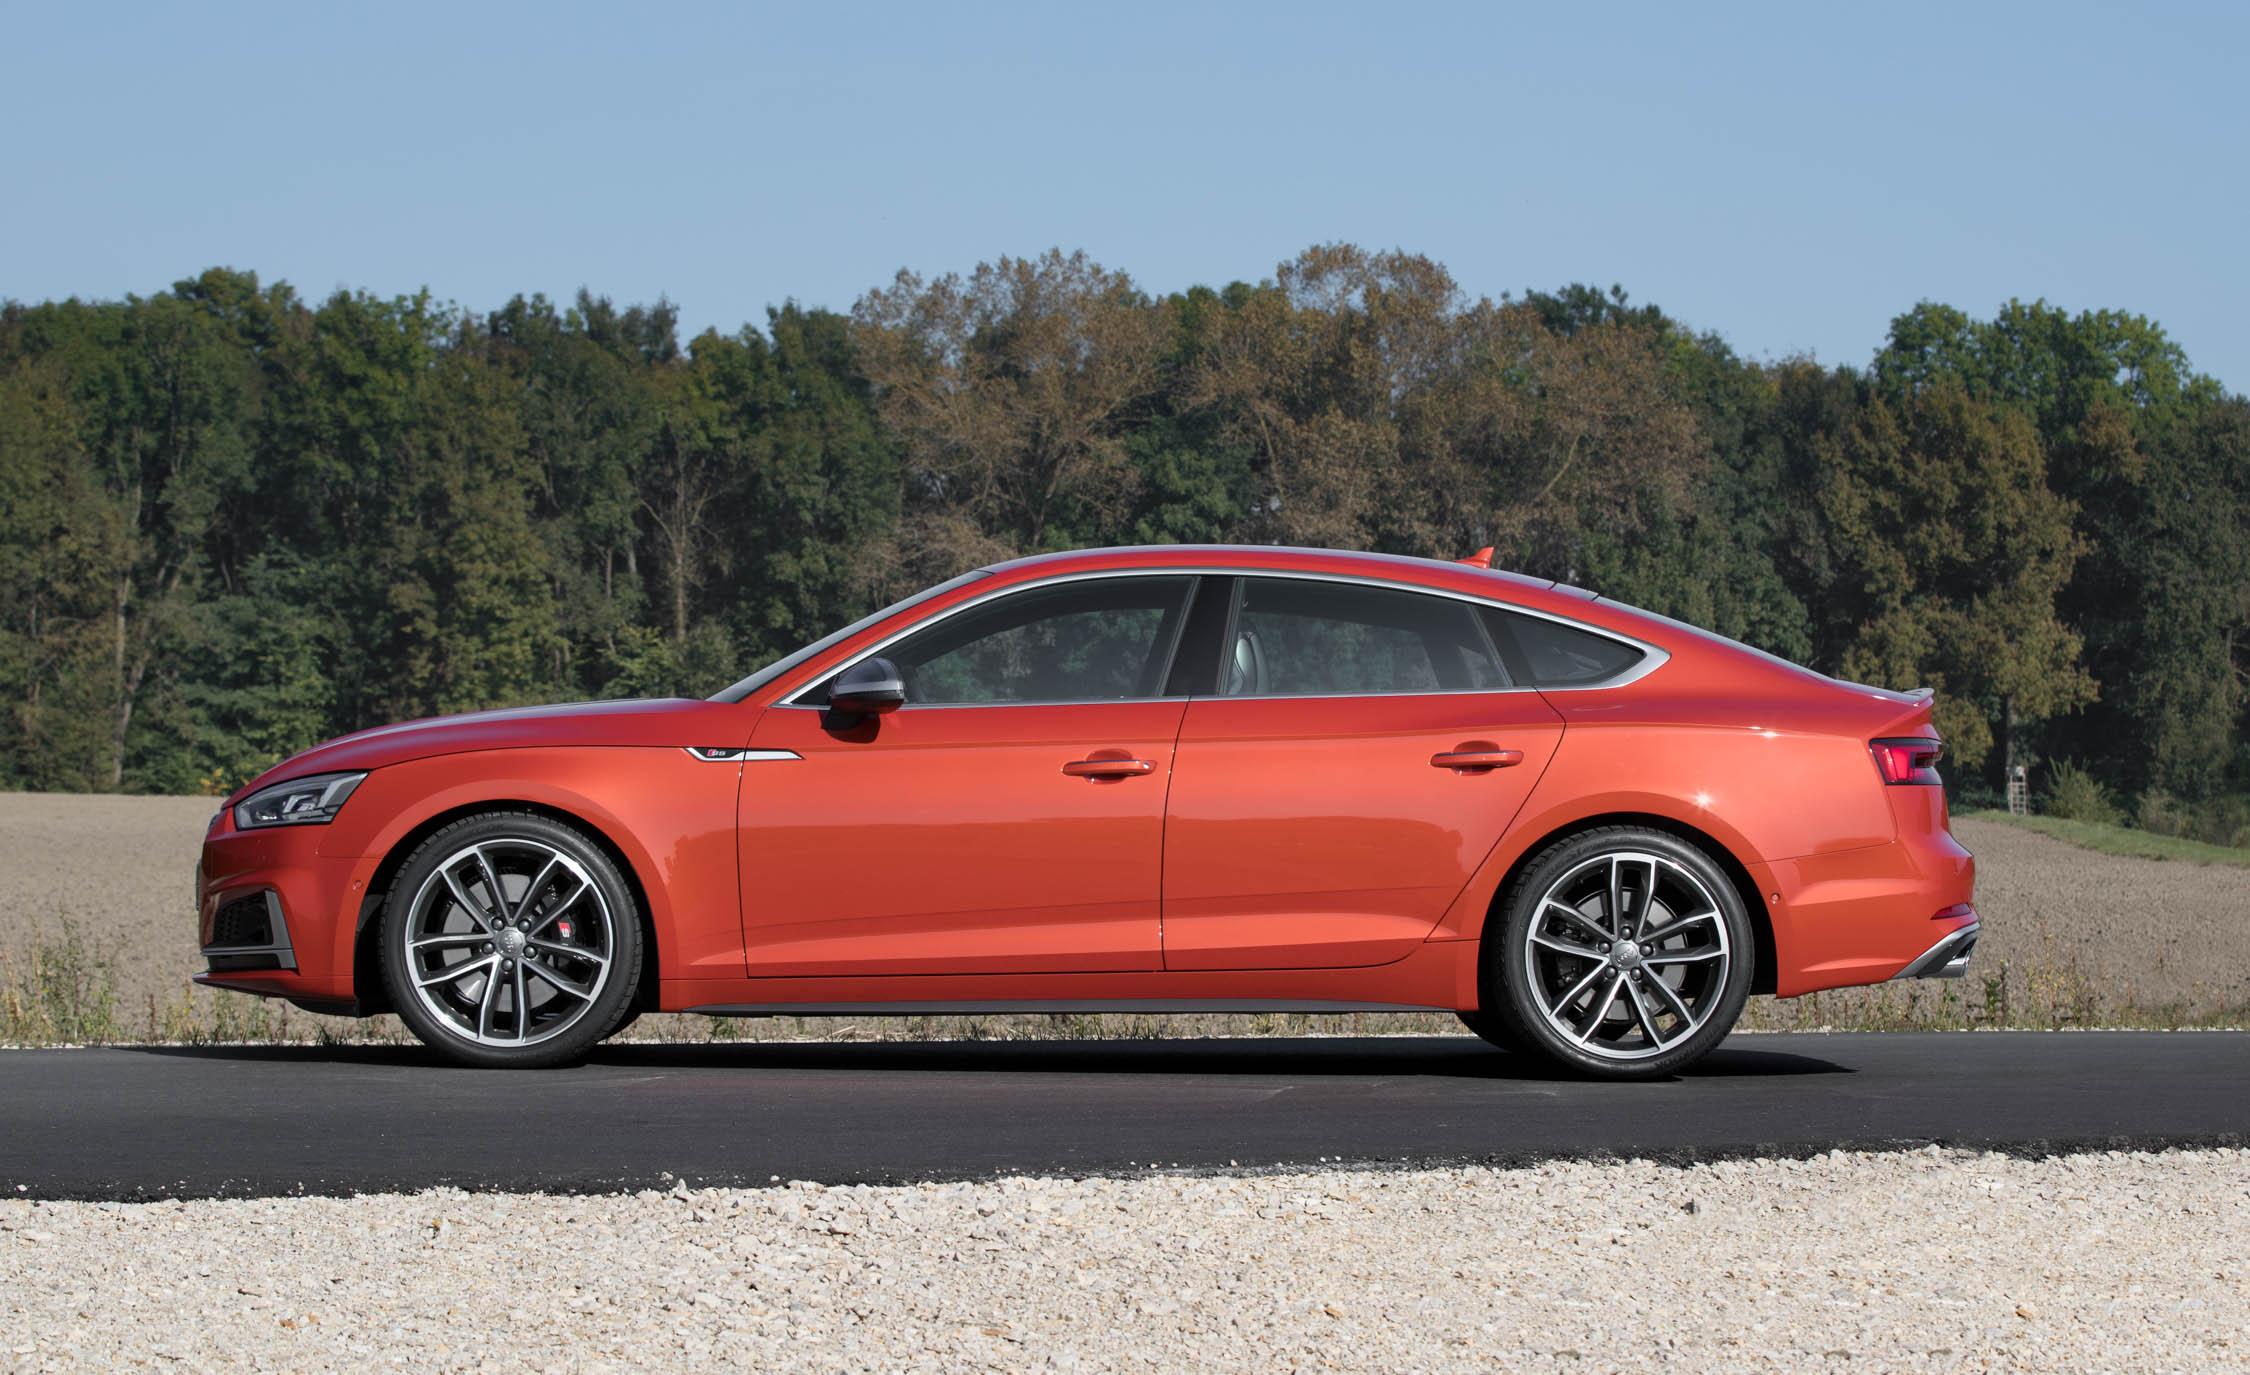 2017 Audi S5 Sportback (View 9 of 10)